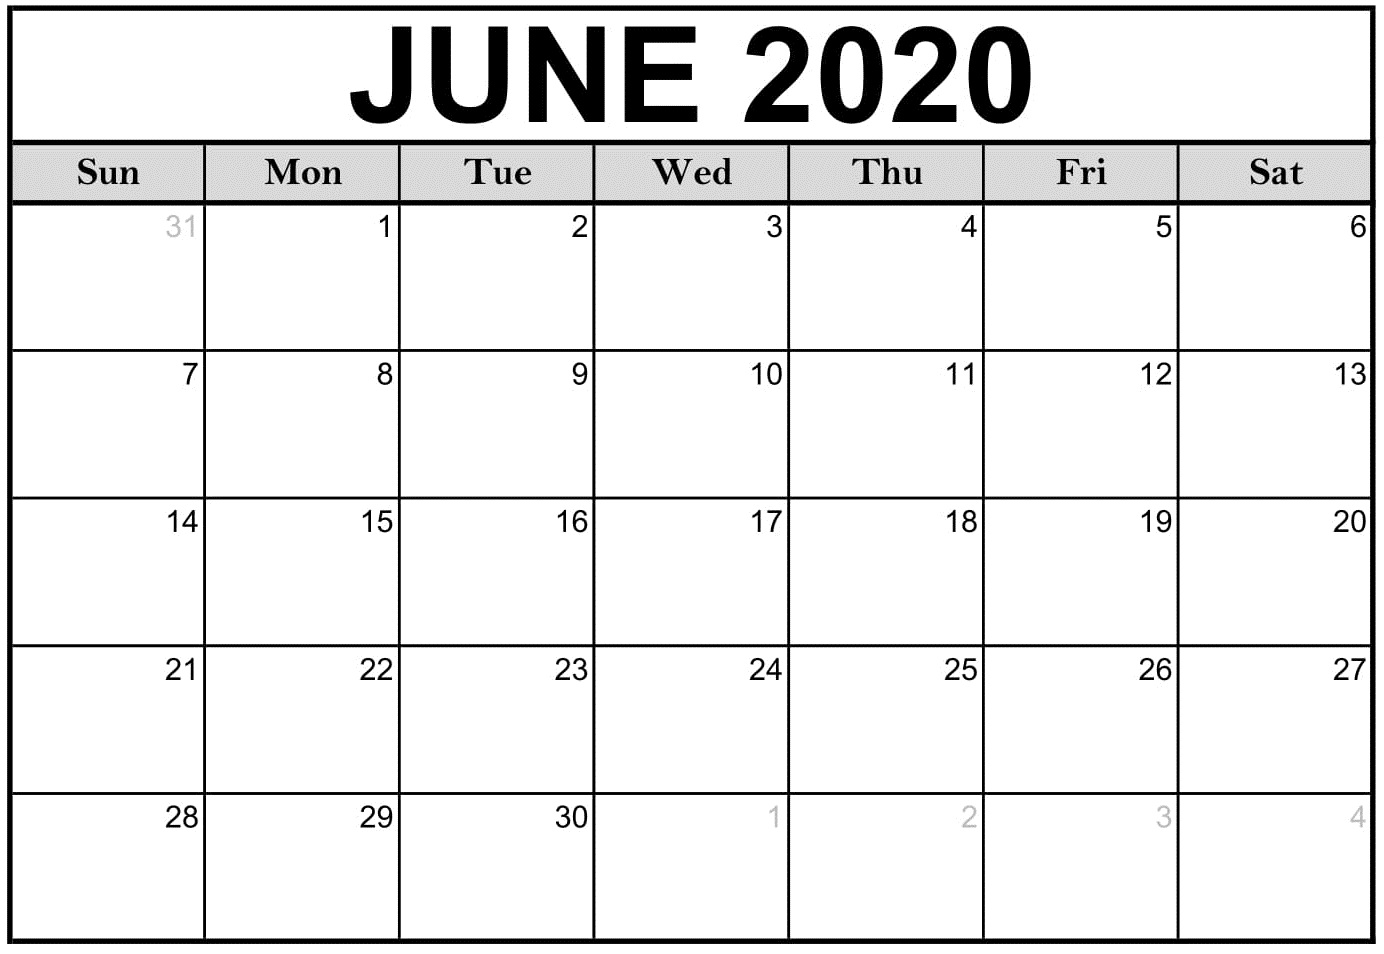 June 2020 Monthly Calendar PDF